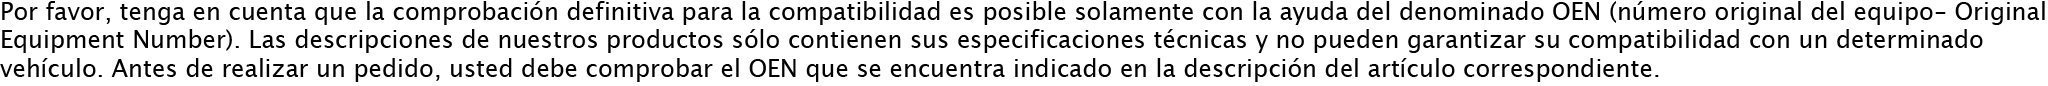 HÜNERSDORF Bidón de reserva